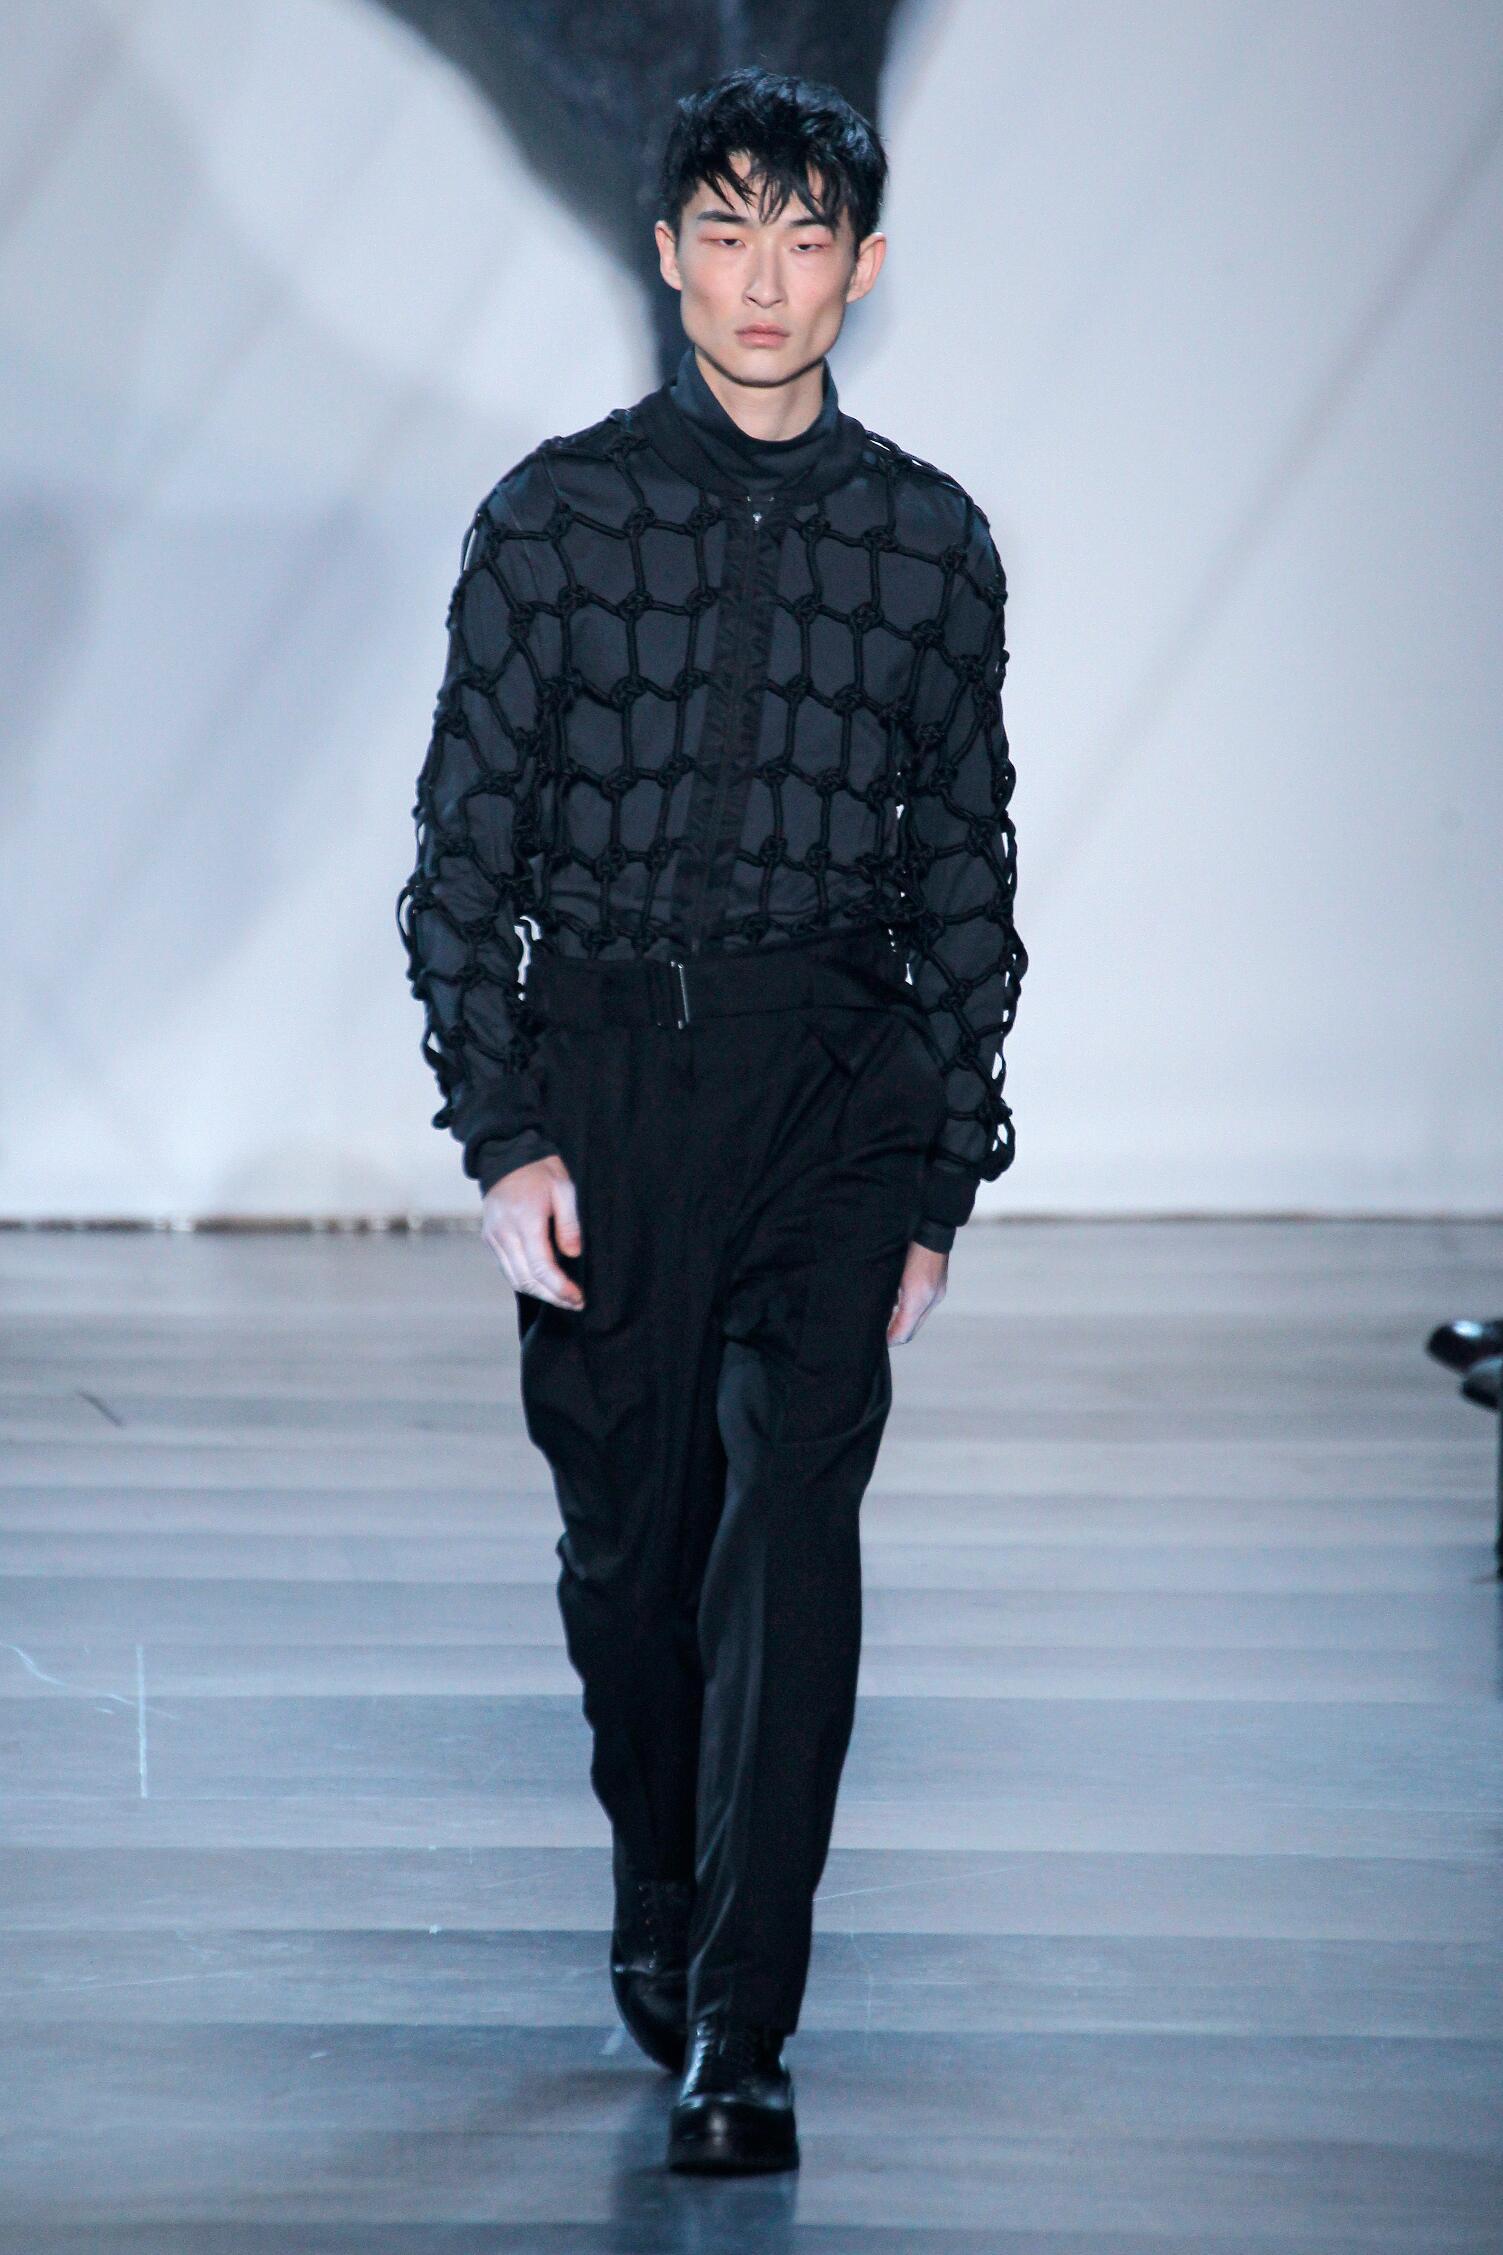 Catwalk 3.1 Phillip Lim Collection Fashion Show Winter 2015